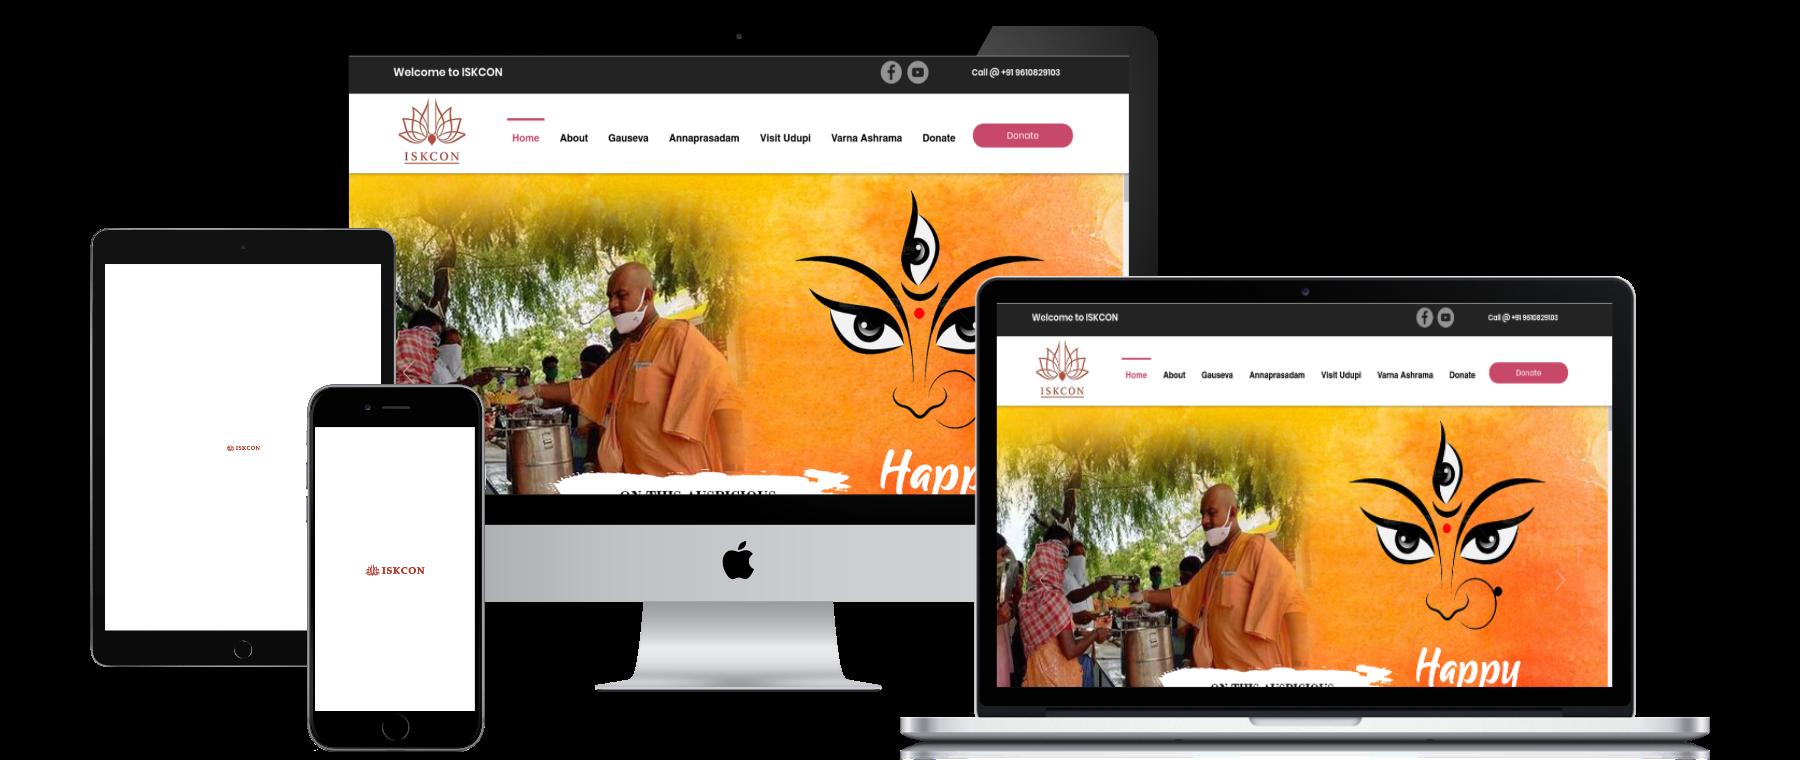 Welcome to ISKCON SRILA PRABHUPADA  His Divine Grace A. C. Bhaktive...